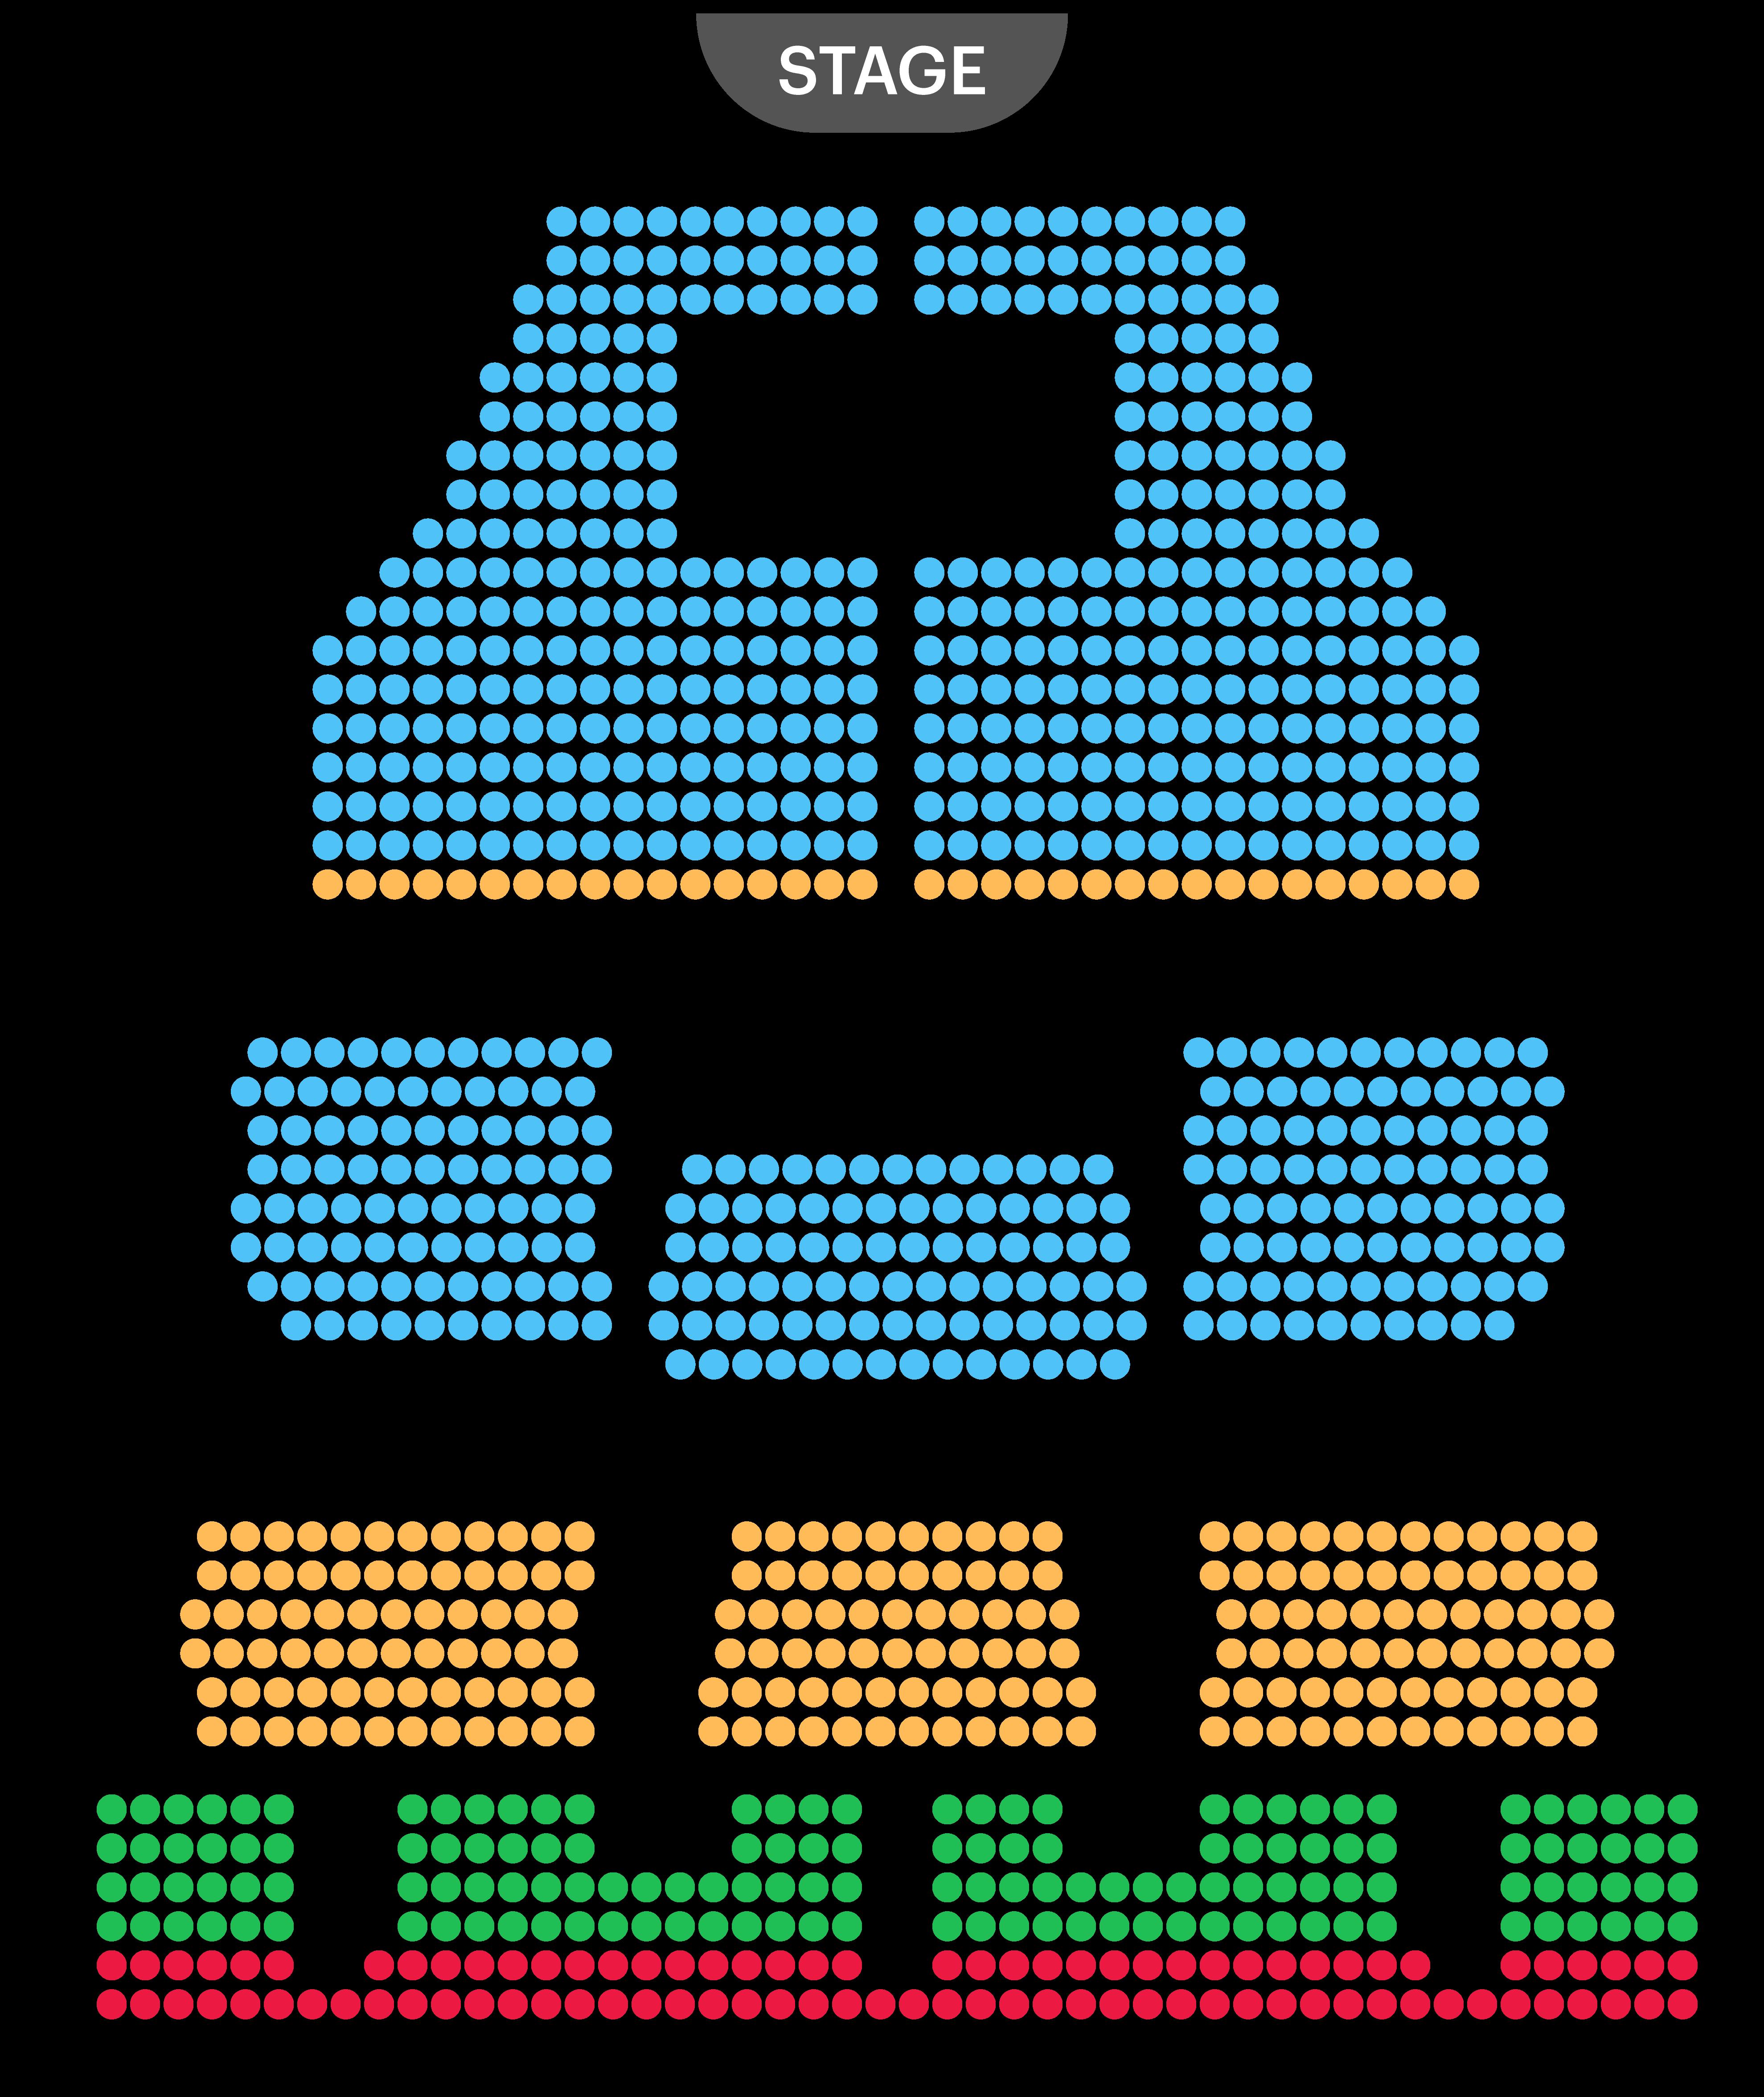 Cambridge Theatre Seating Map